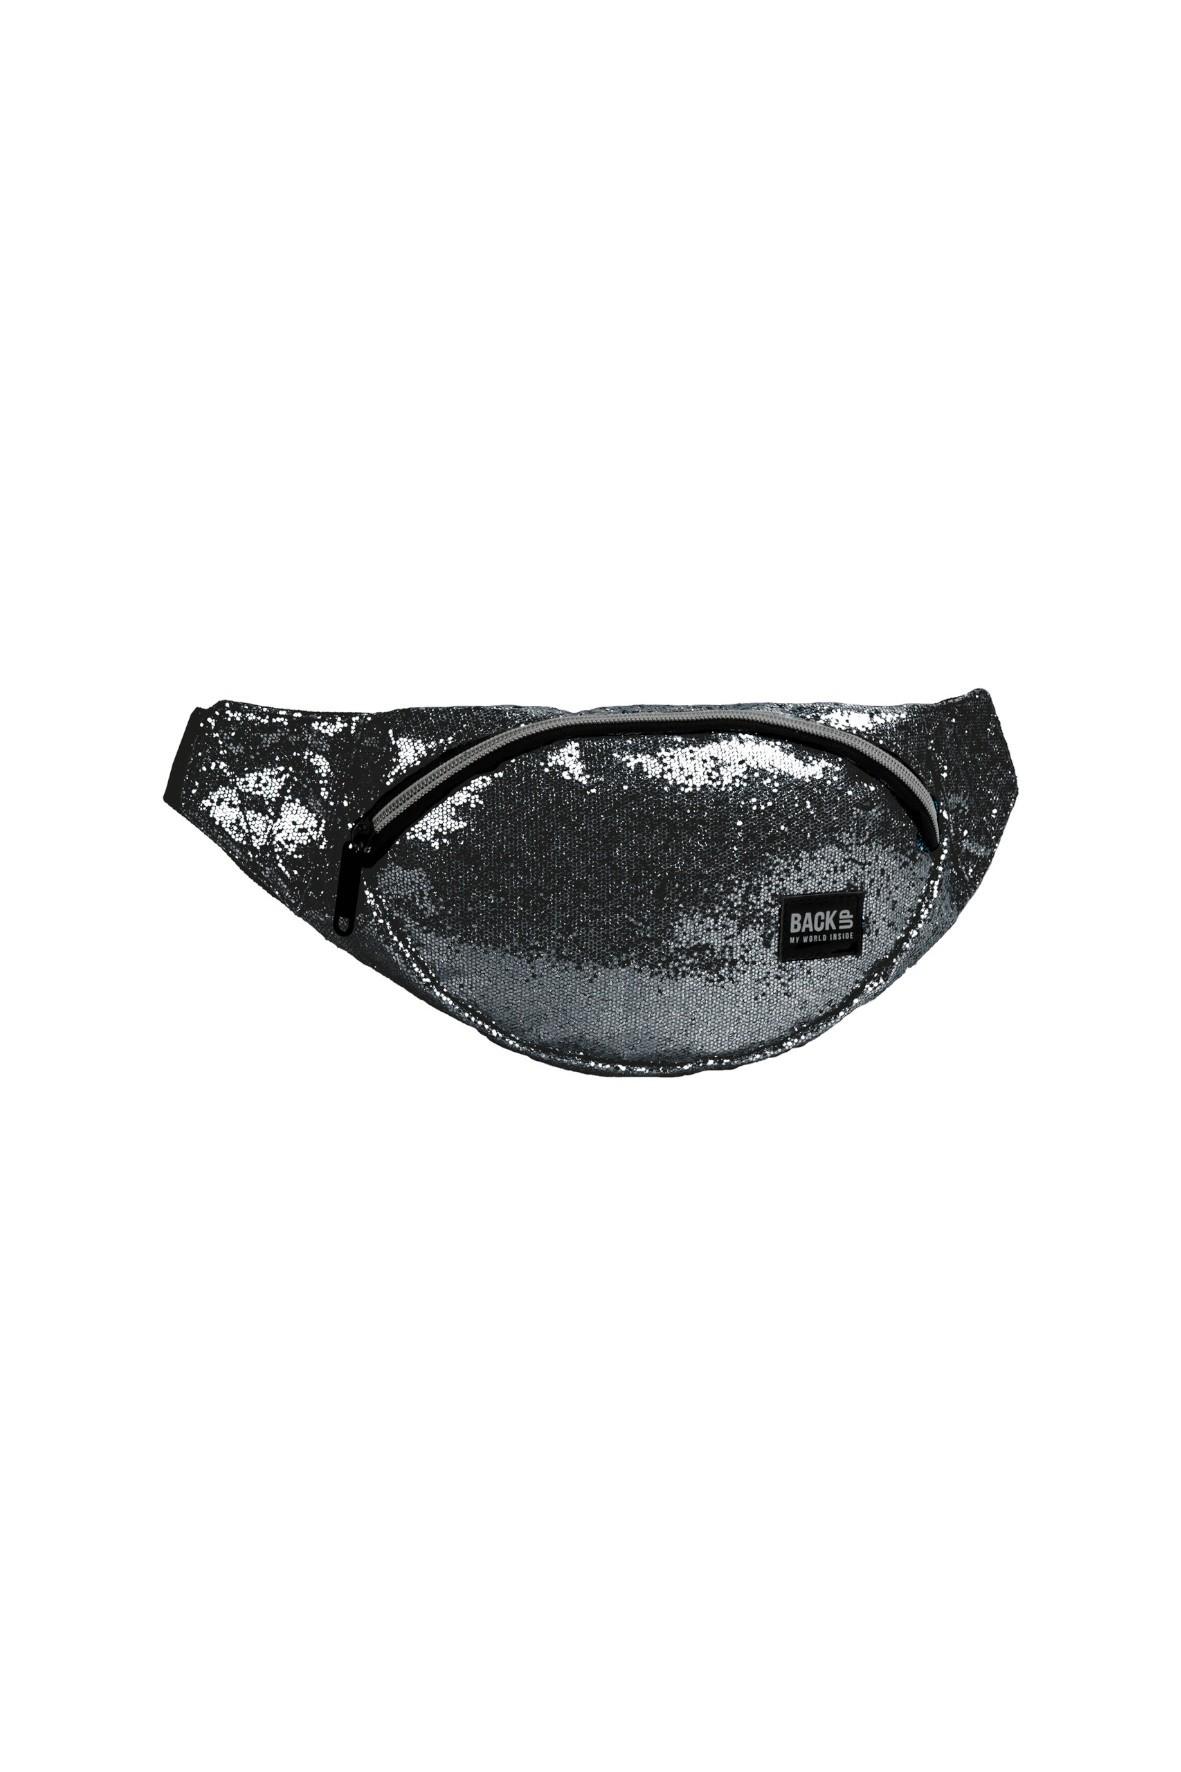 Torba na biodra- czarny brokat